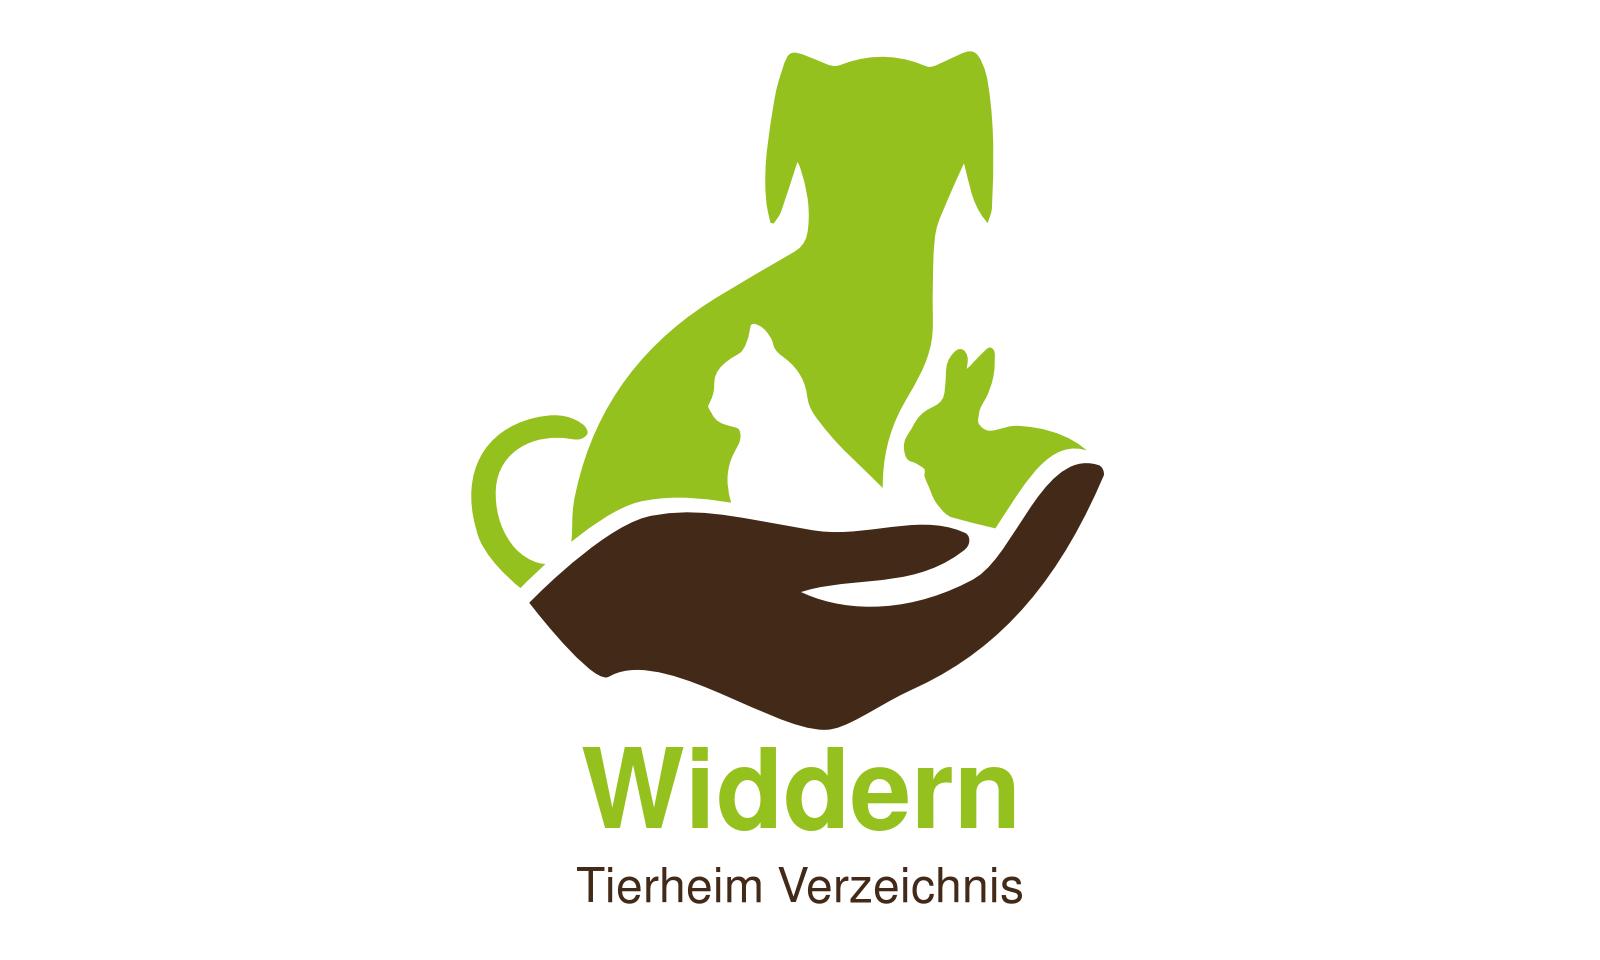 Tierheim Widdern